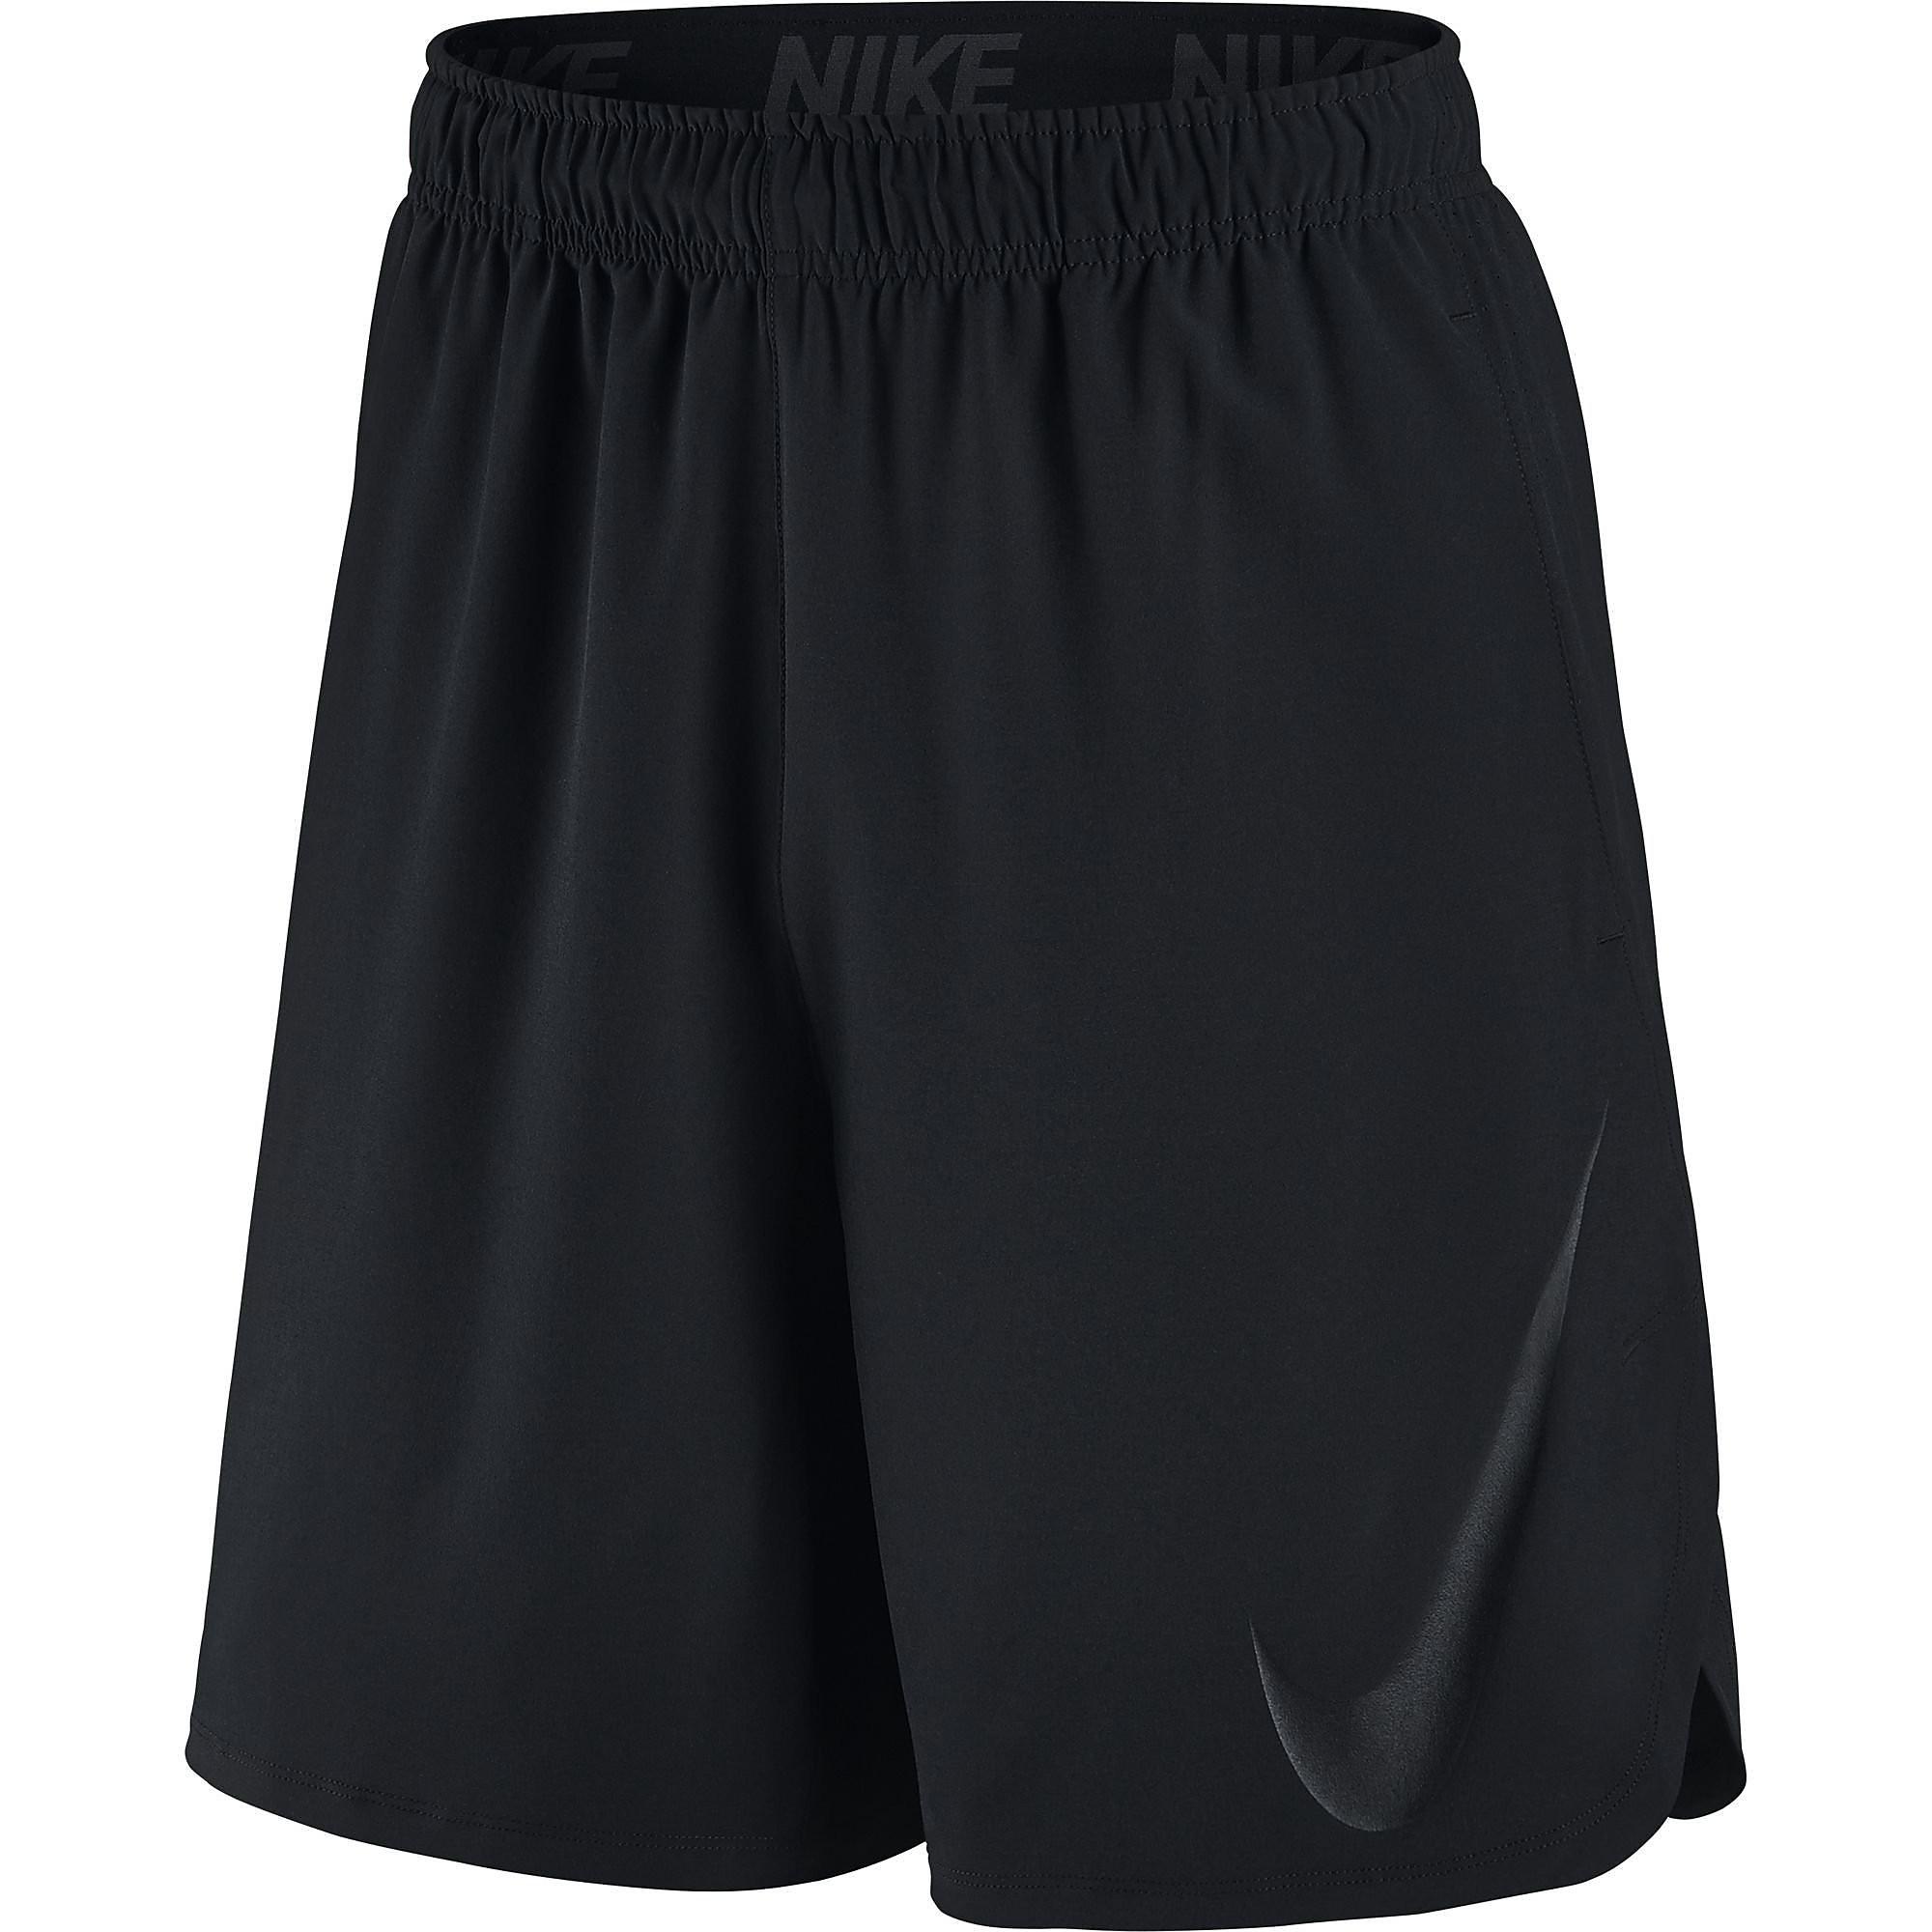 Nike HYPERSPEED WOVEN SHORT